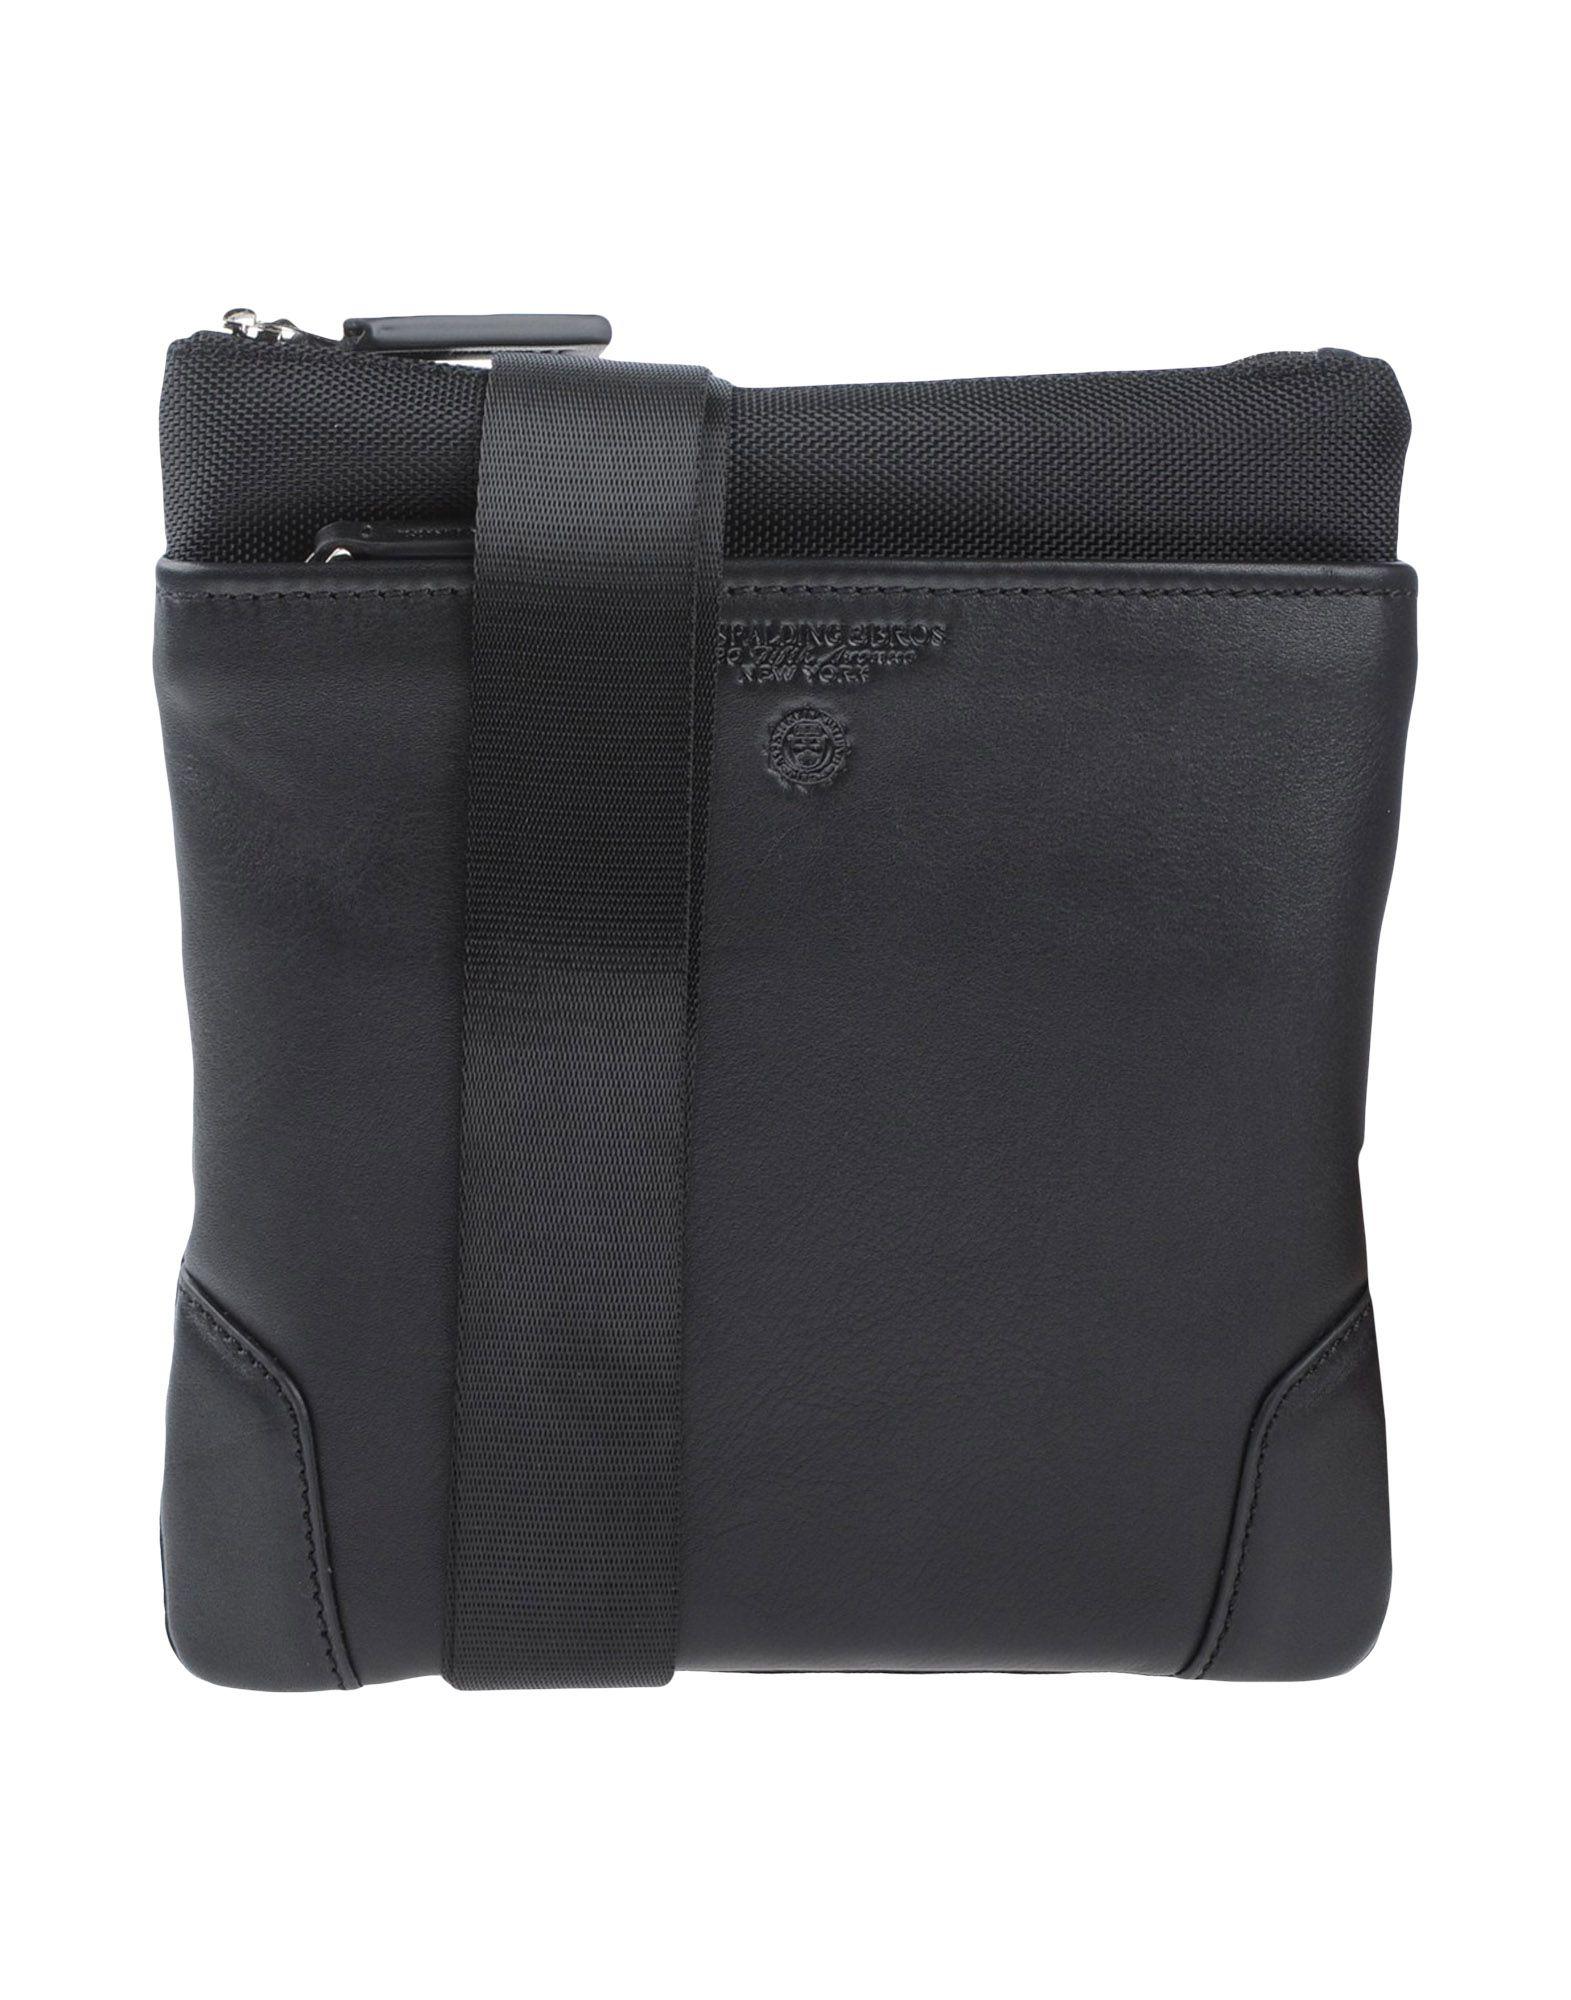 A.G. SPALDING & BROS. 520 FIFTH AVENUE New York Сумка через плечо сумка через плечо brand new 2 7 hombre maletin b10023